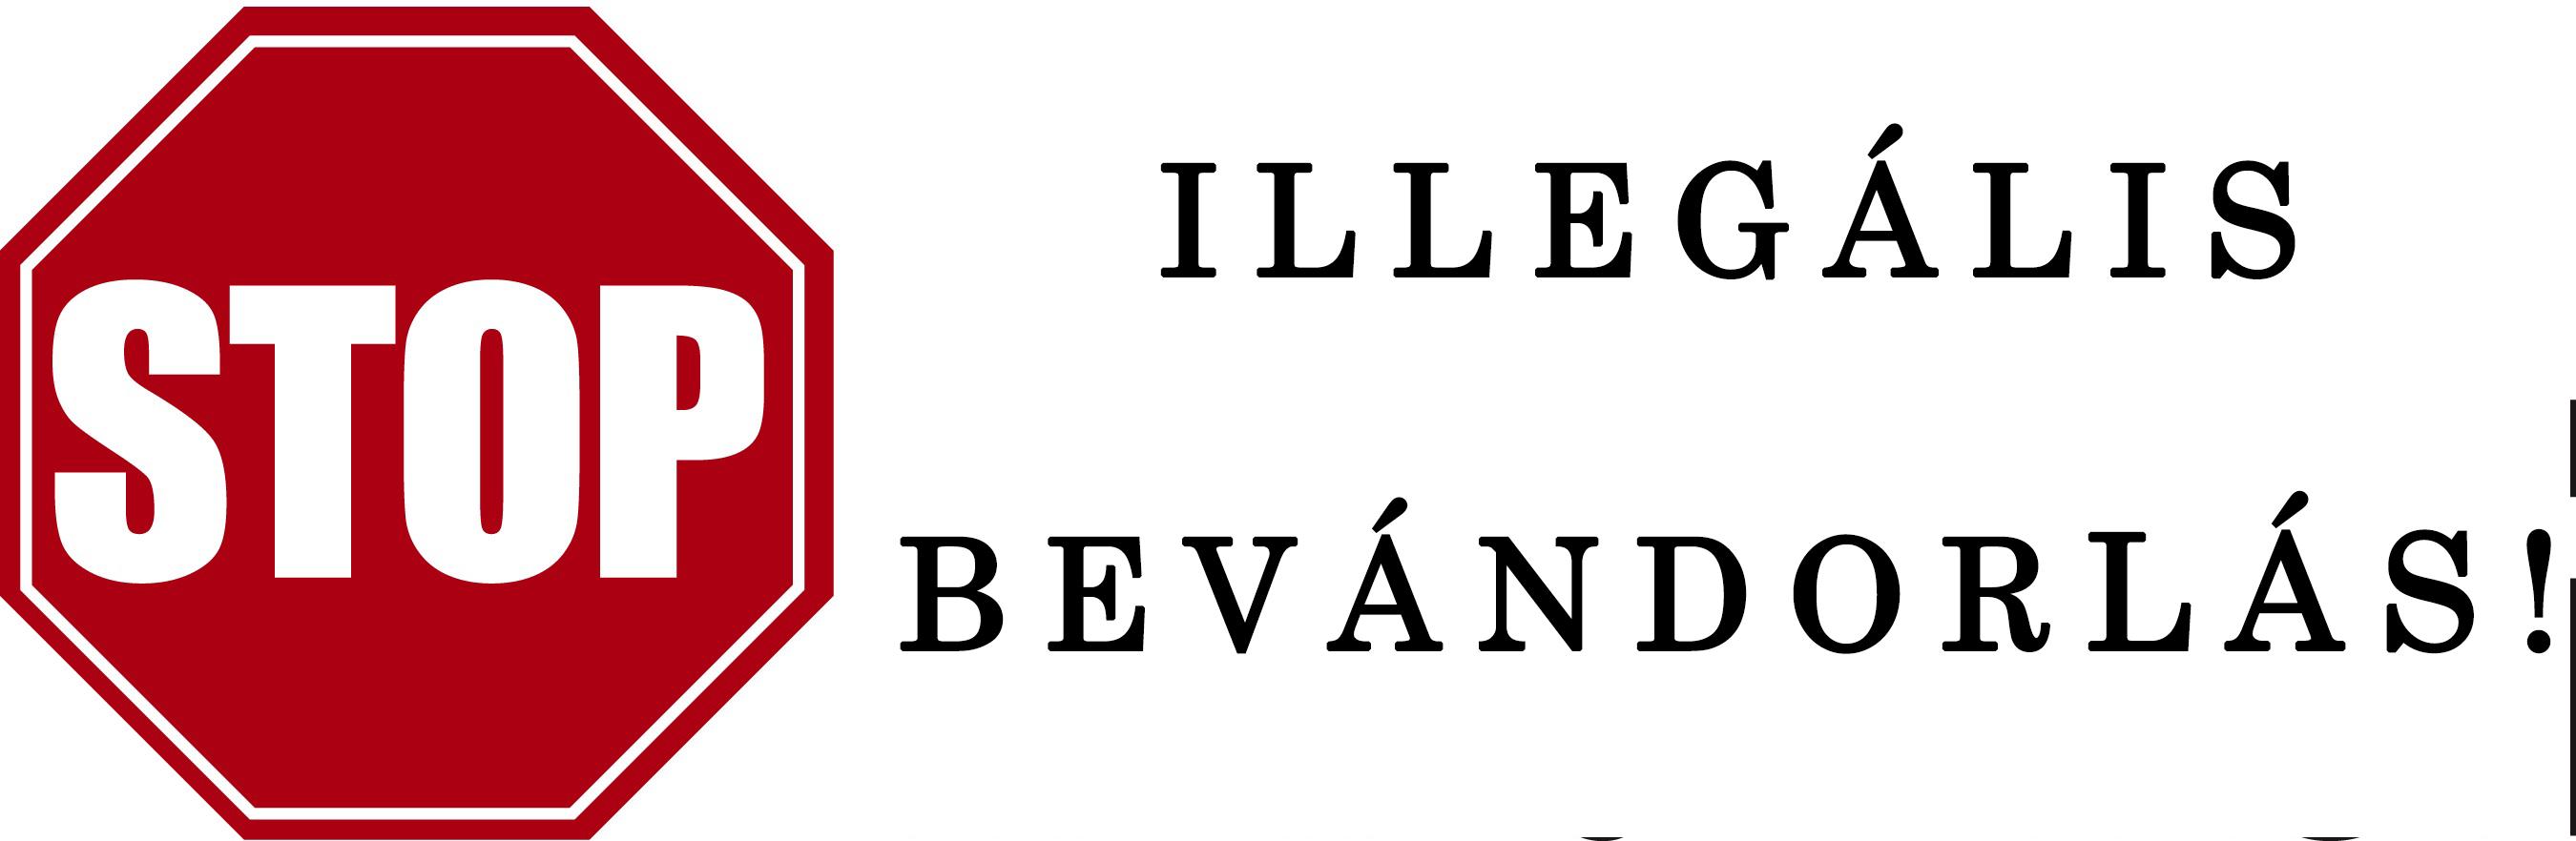 illegalis_bevandorlas_Stop